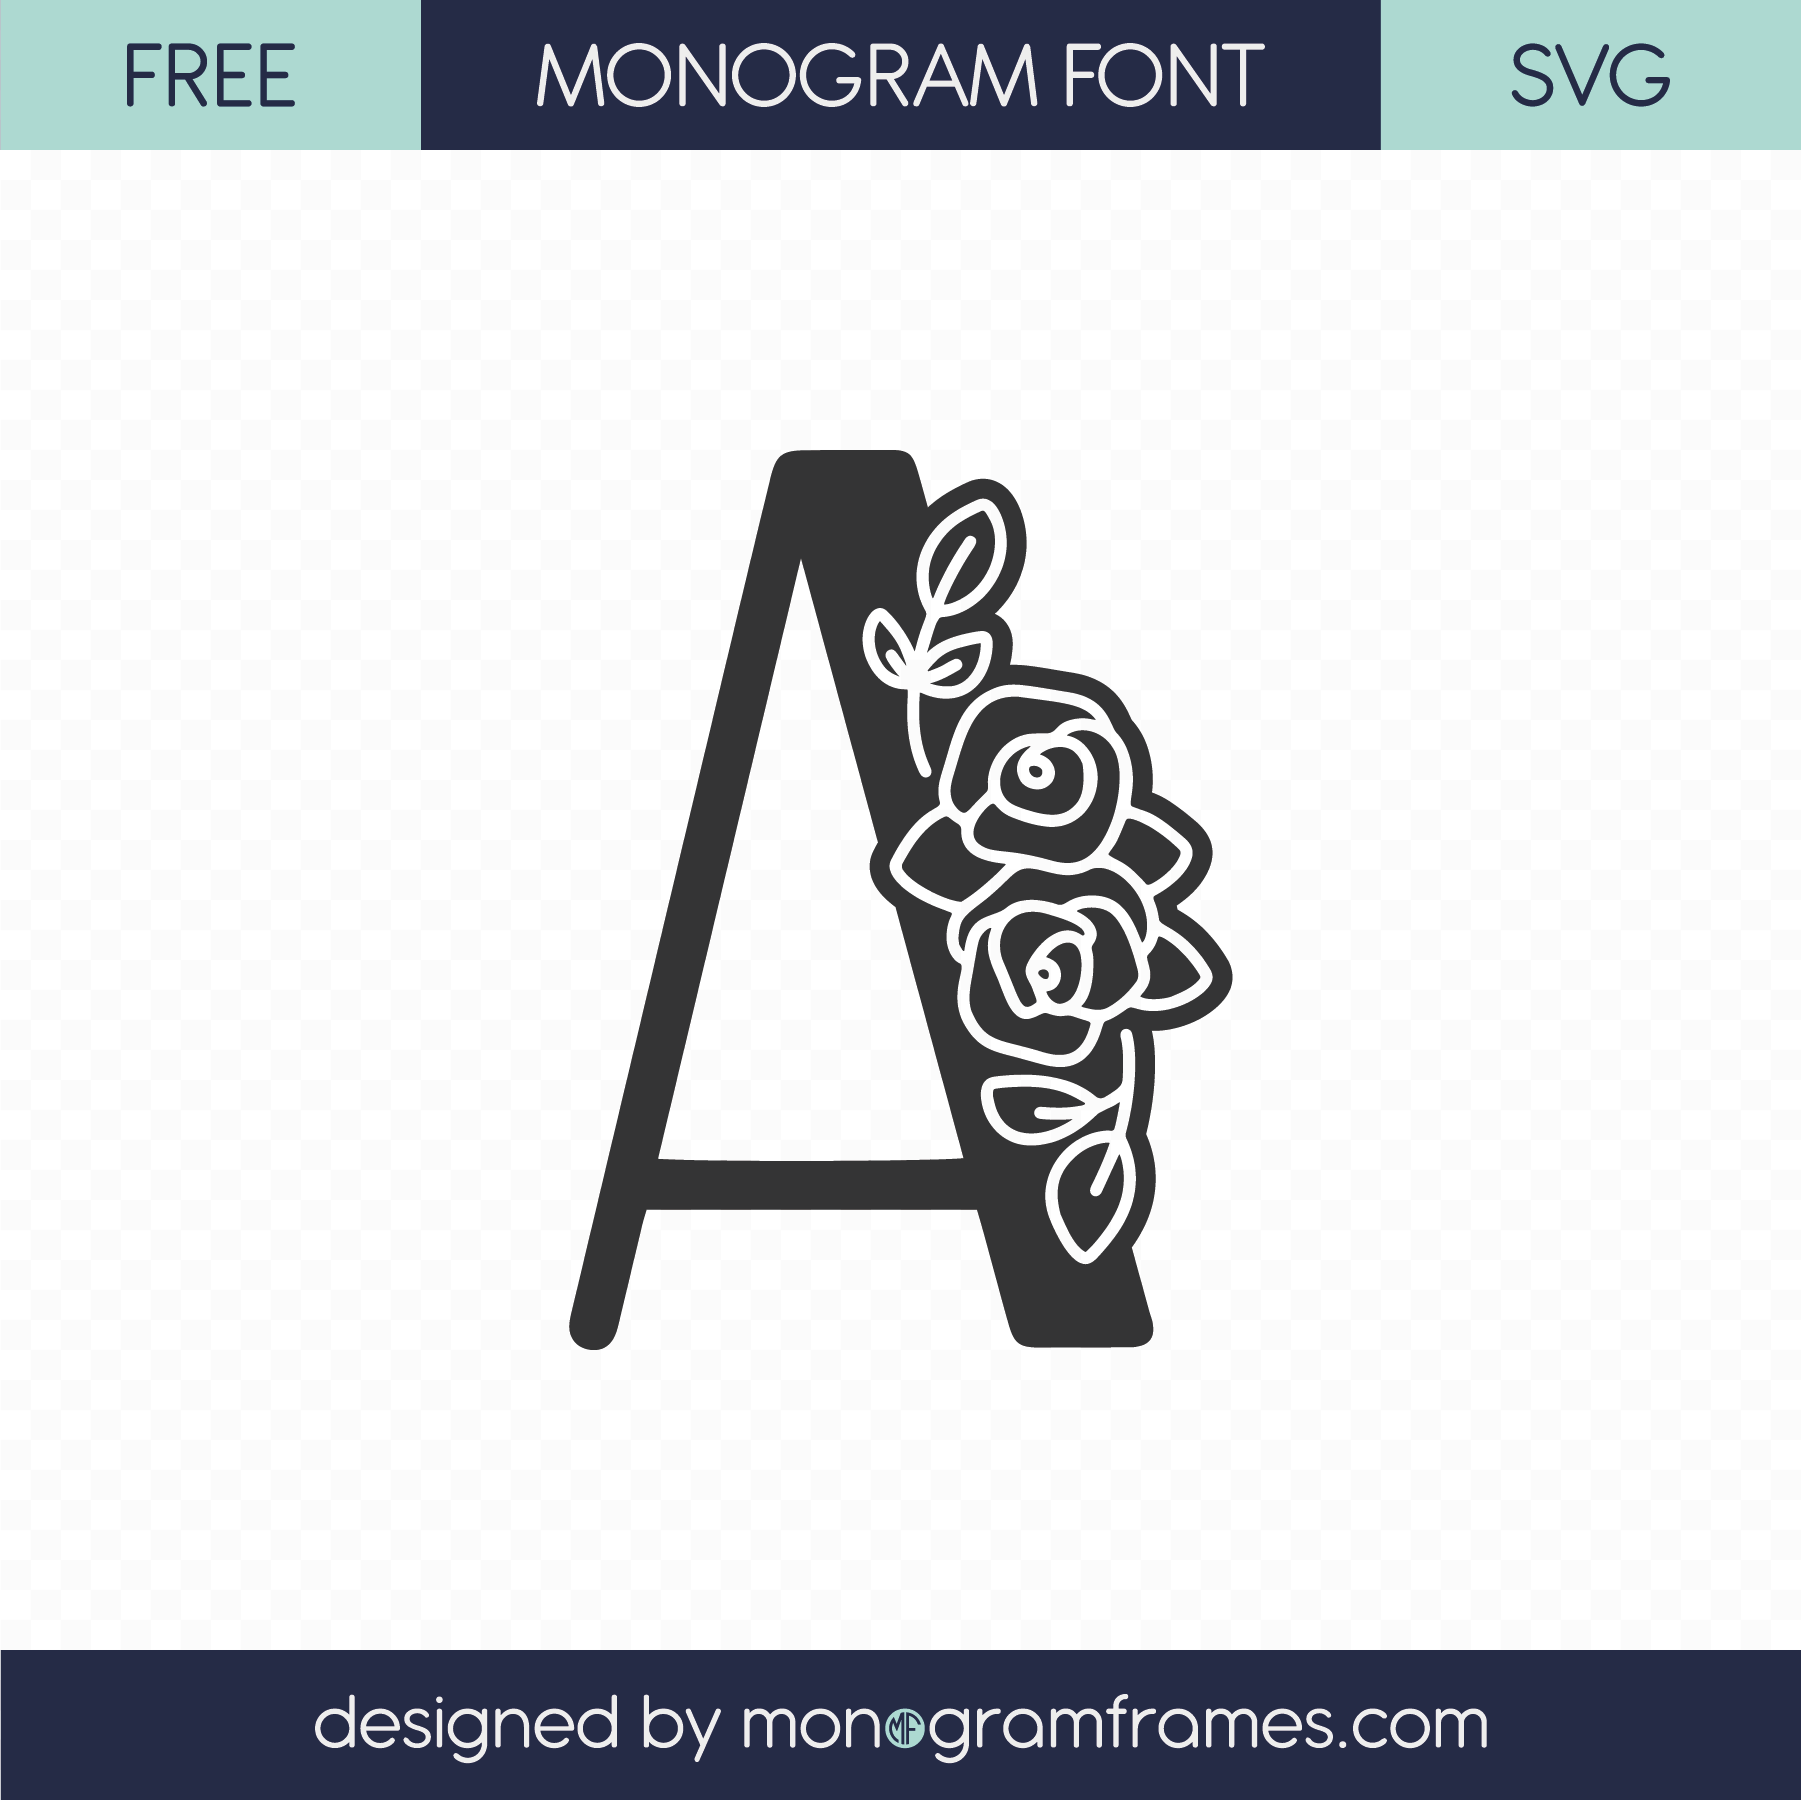 48++ Monogram fonts for cricut free ideas